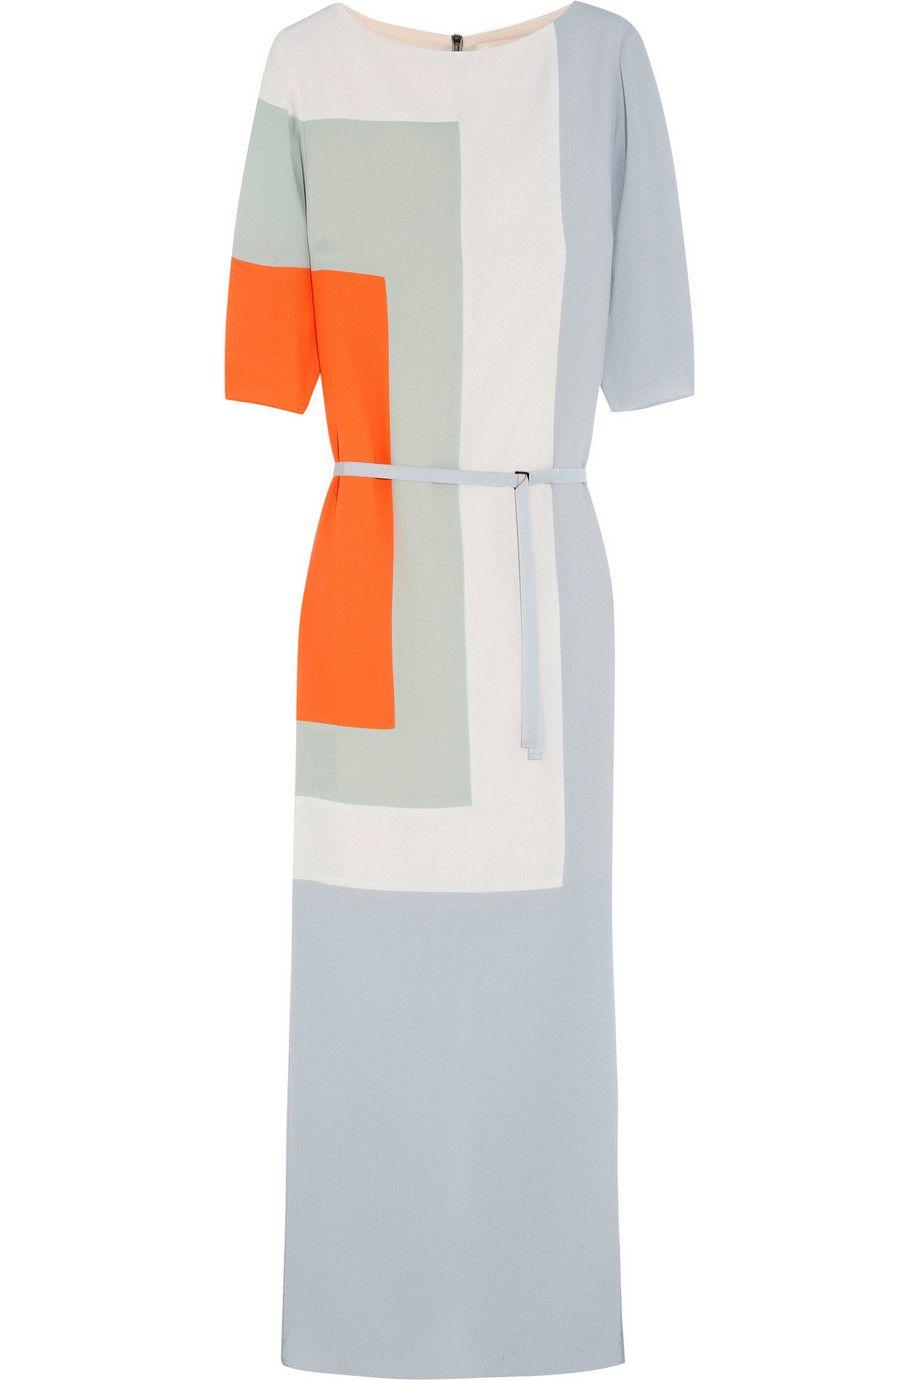 Roksanda ilincic colorblock woolcrepe gown netaportercom